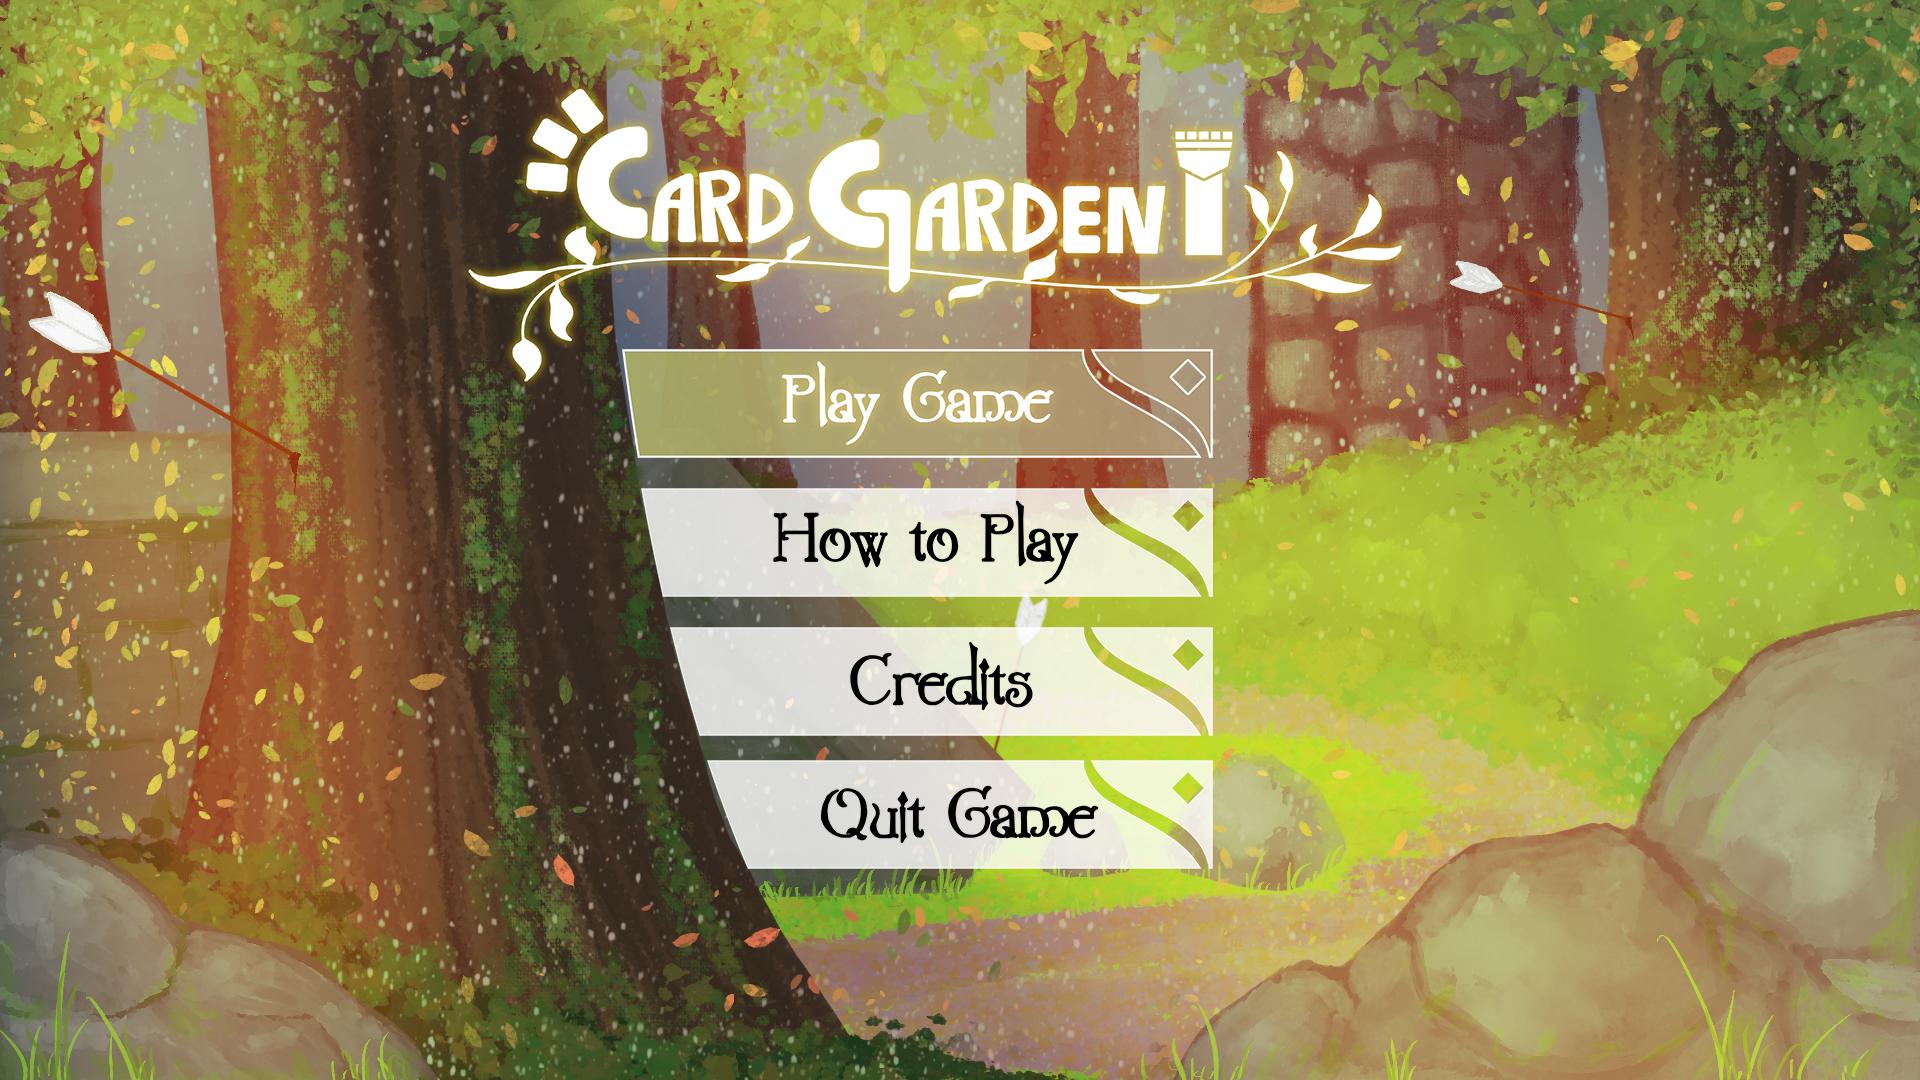 CardGardensMMMockup.png